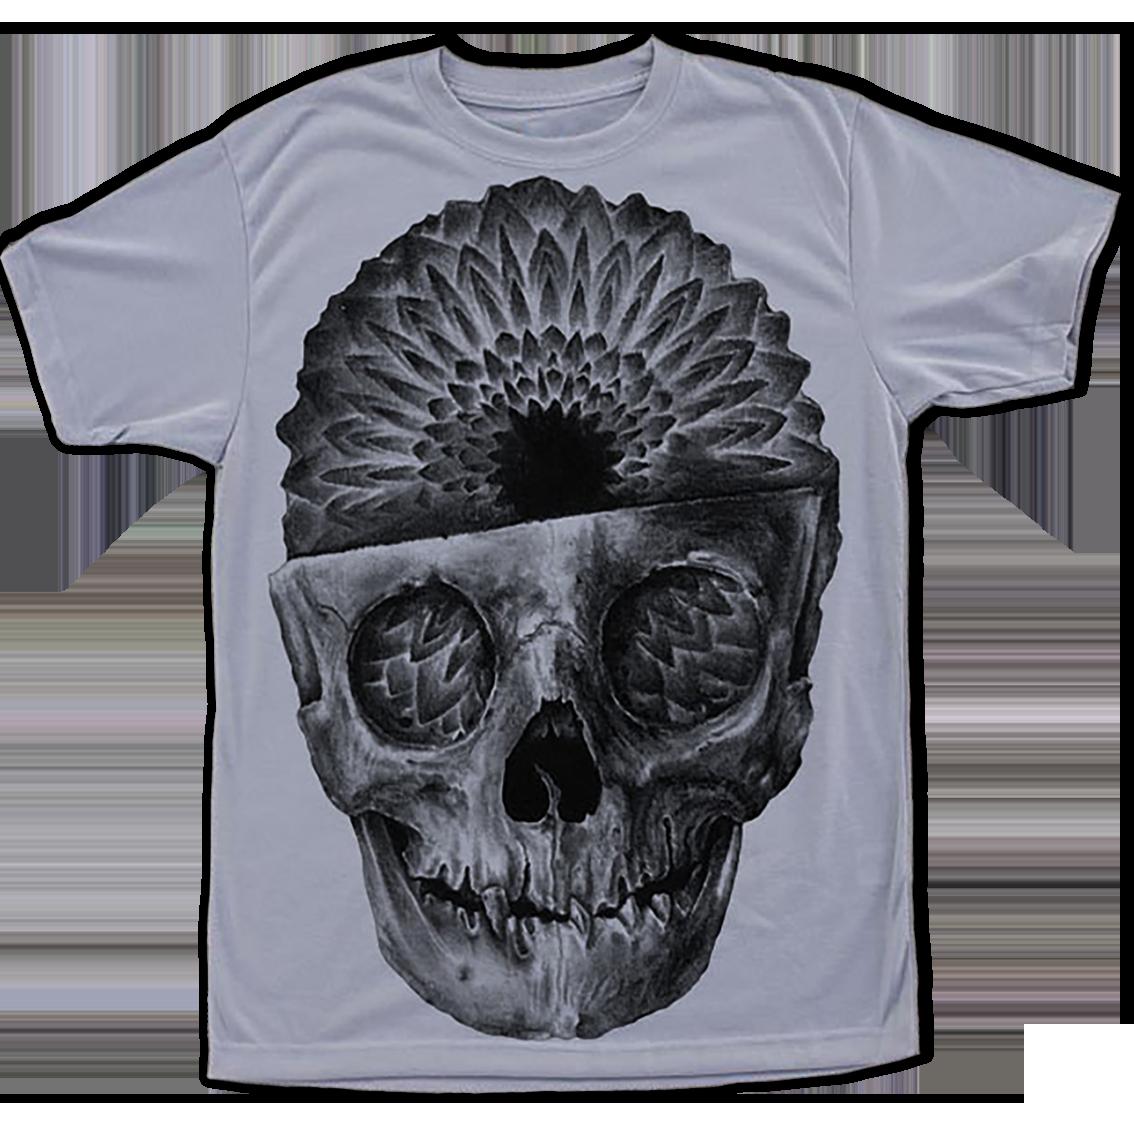 Vapor basic t-shirt, A3 print